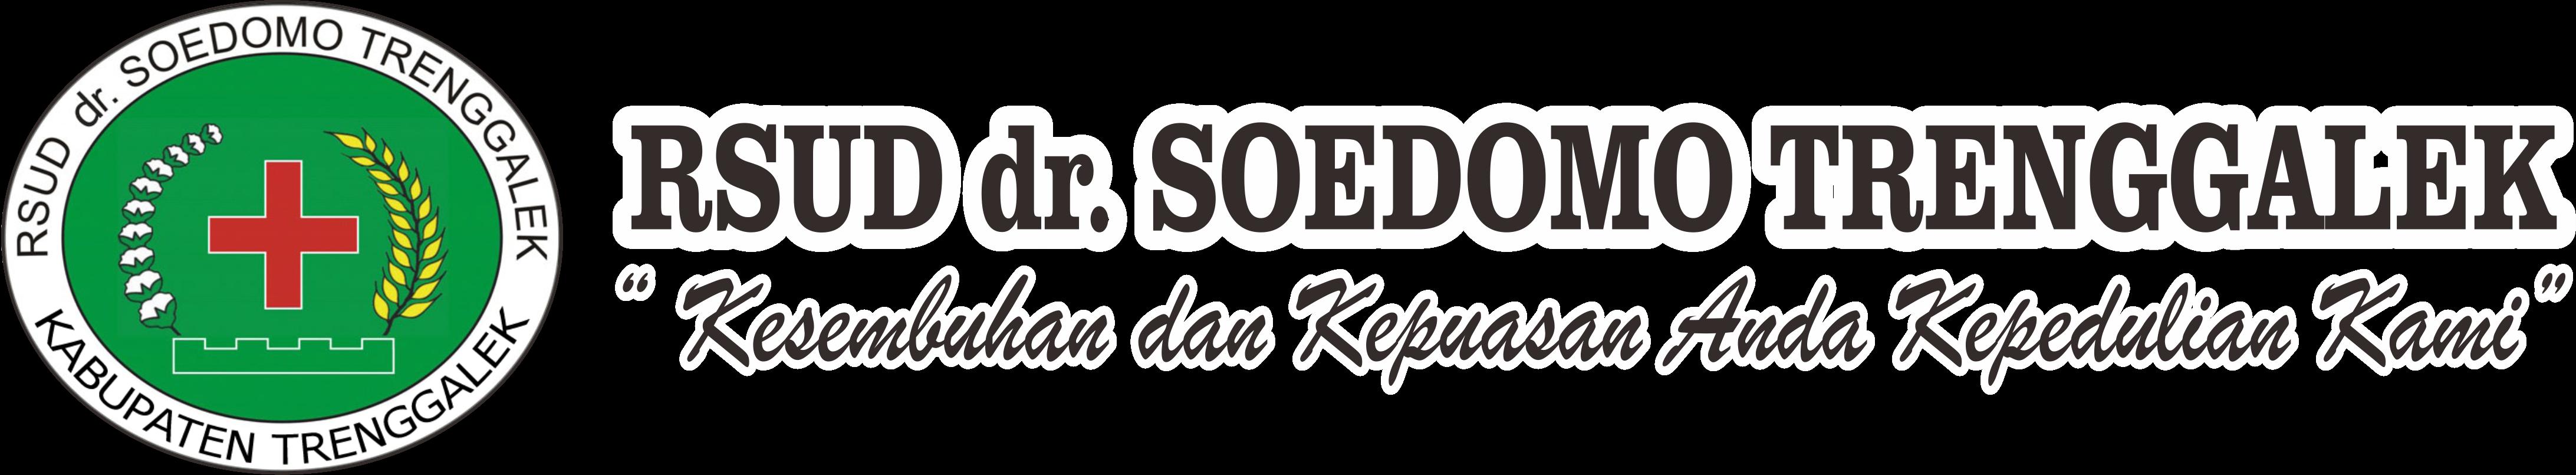 RSUD Dr Soedomo